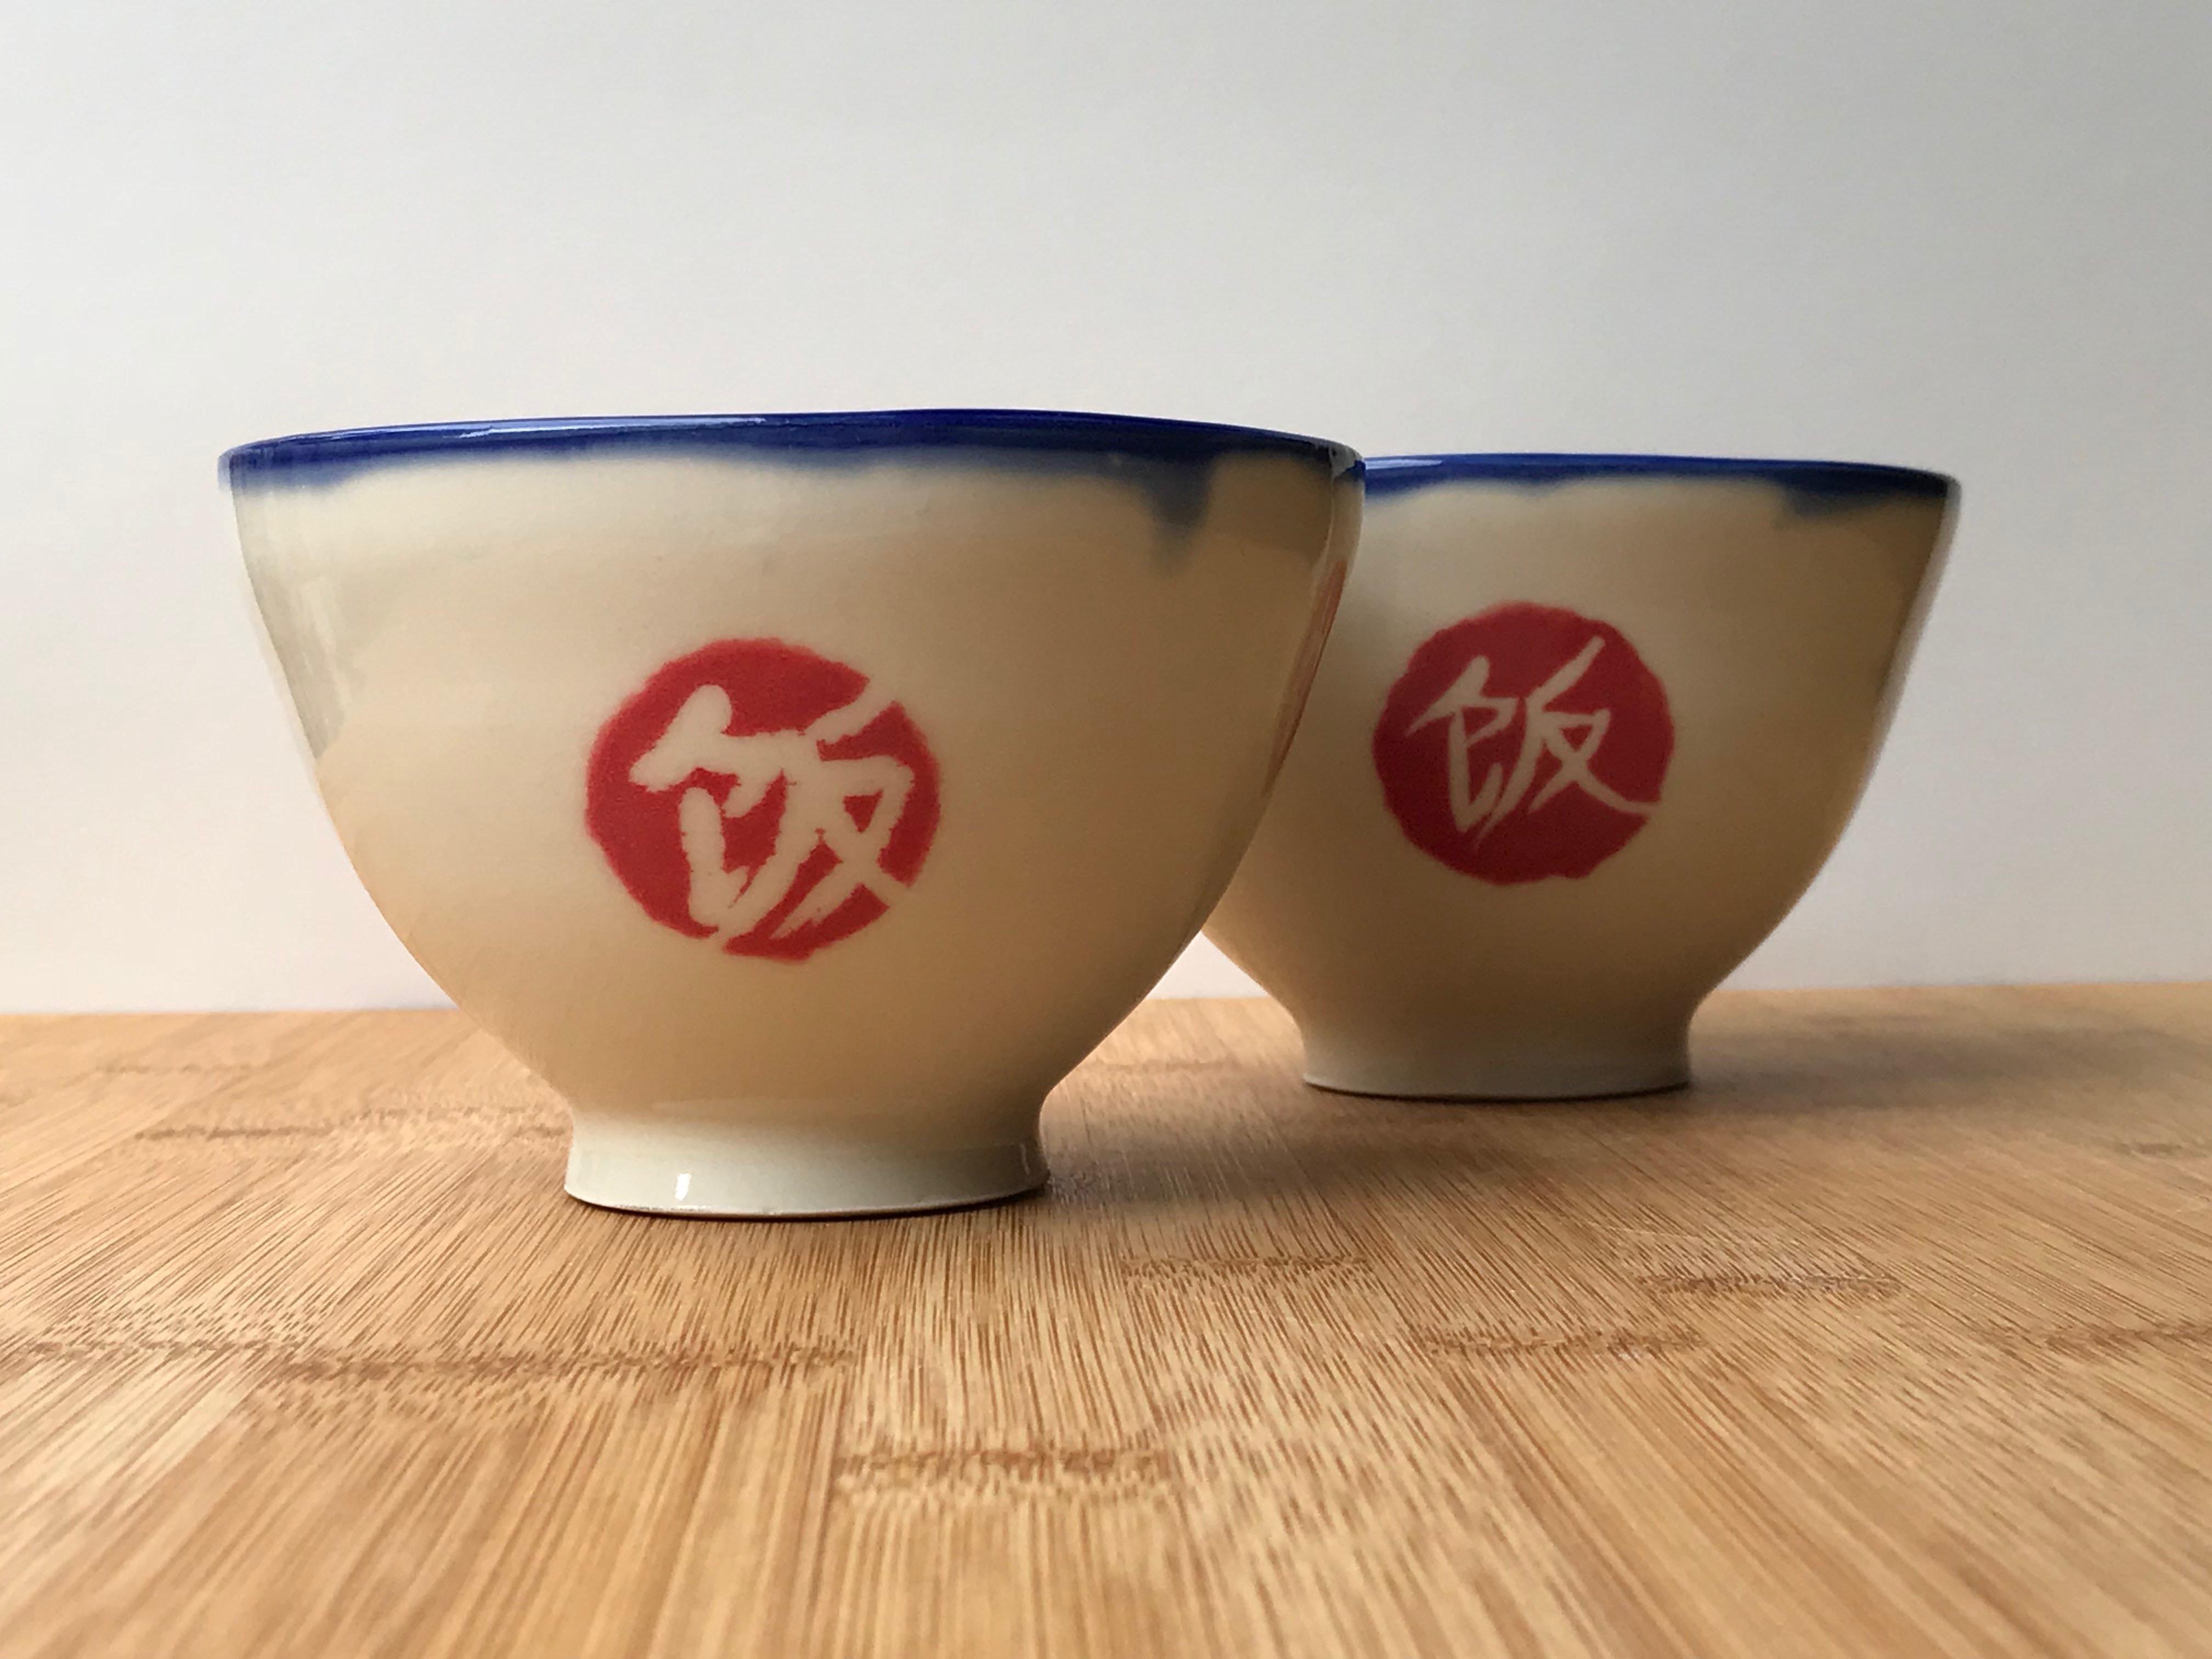 Yin-Meng Tan